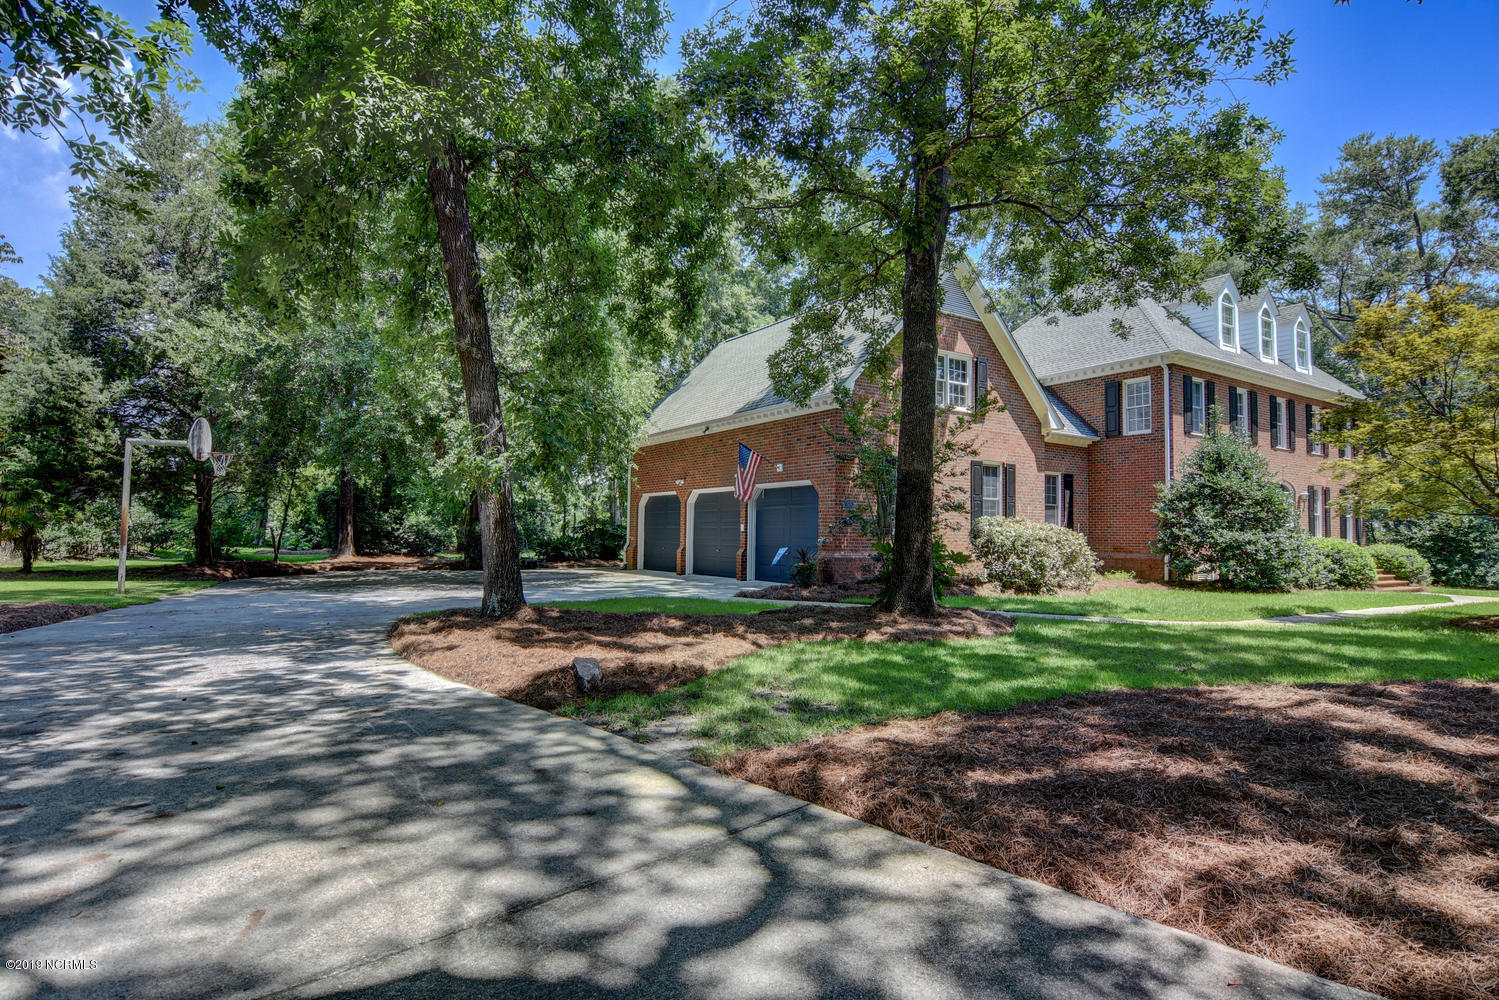 129 Middle Oaks Drive Wilmington, NC 28409